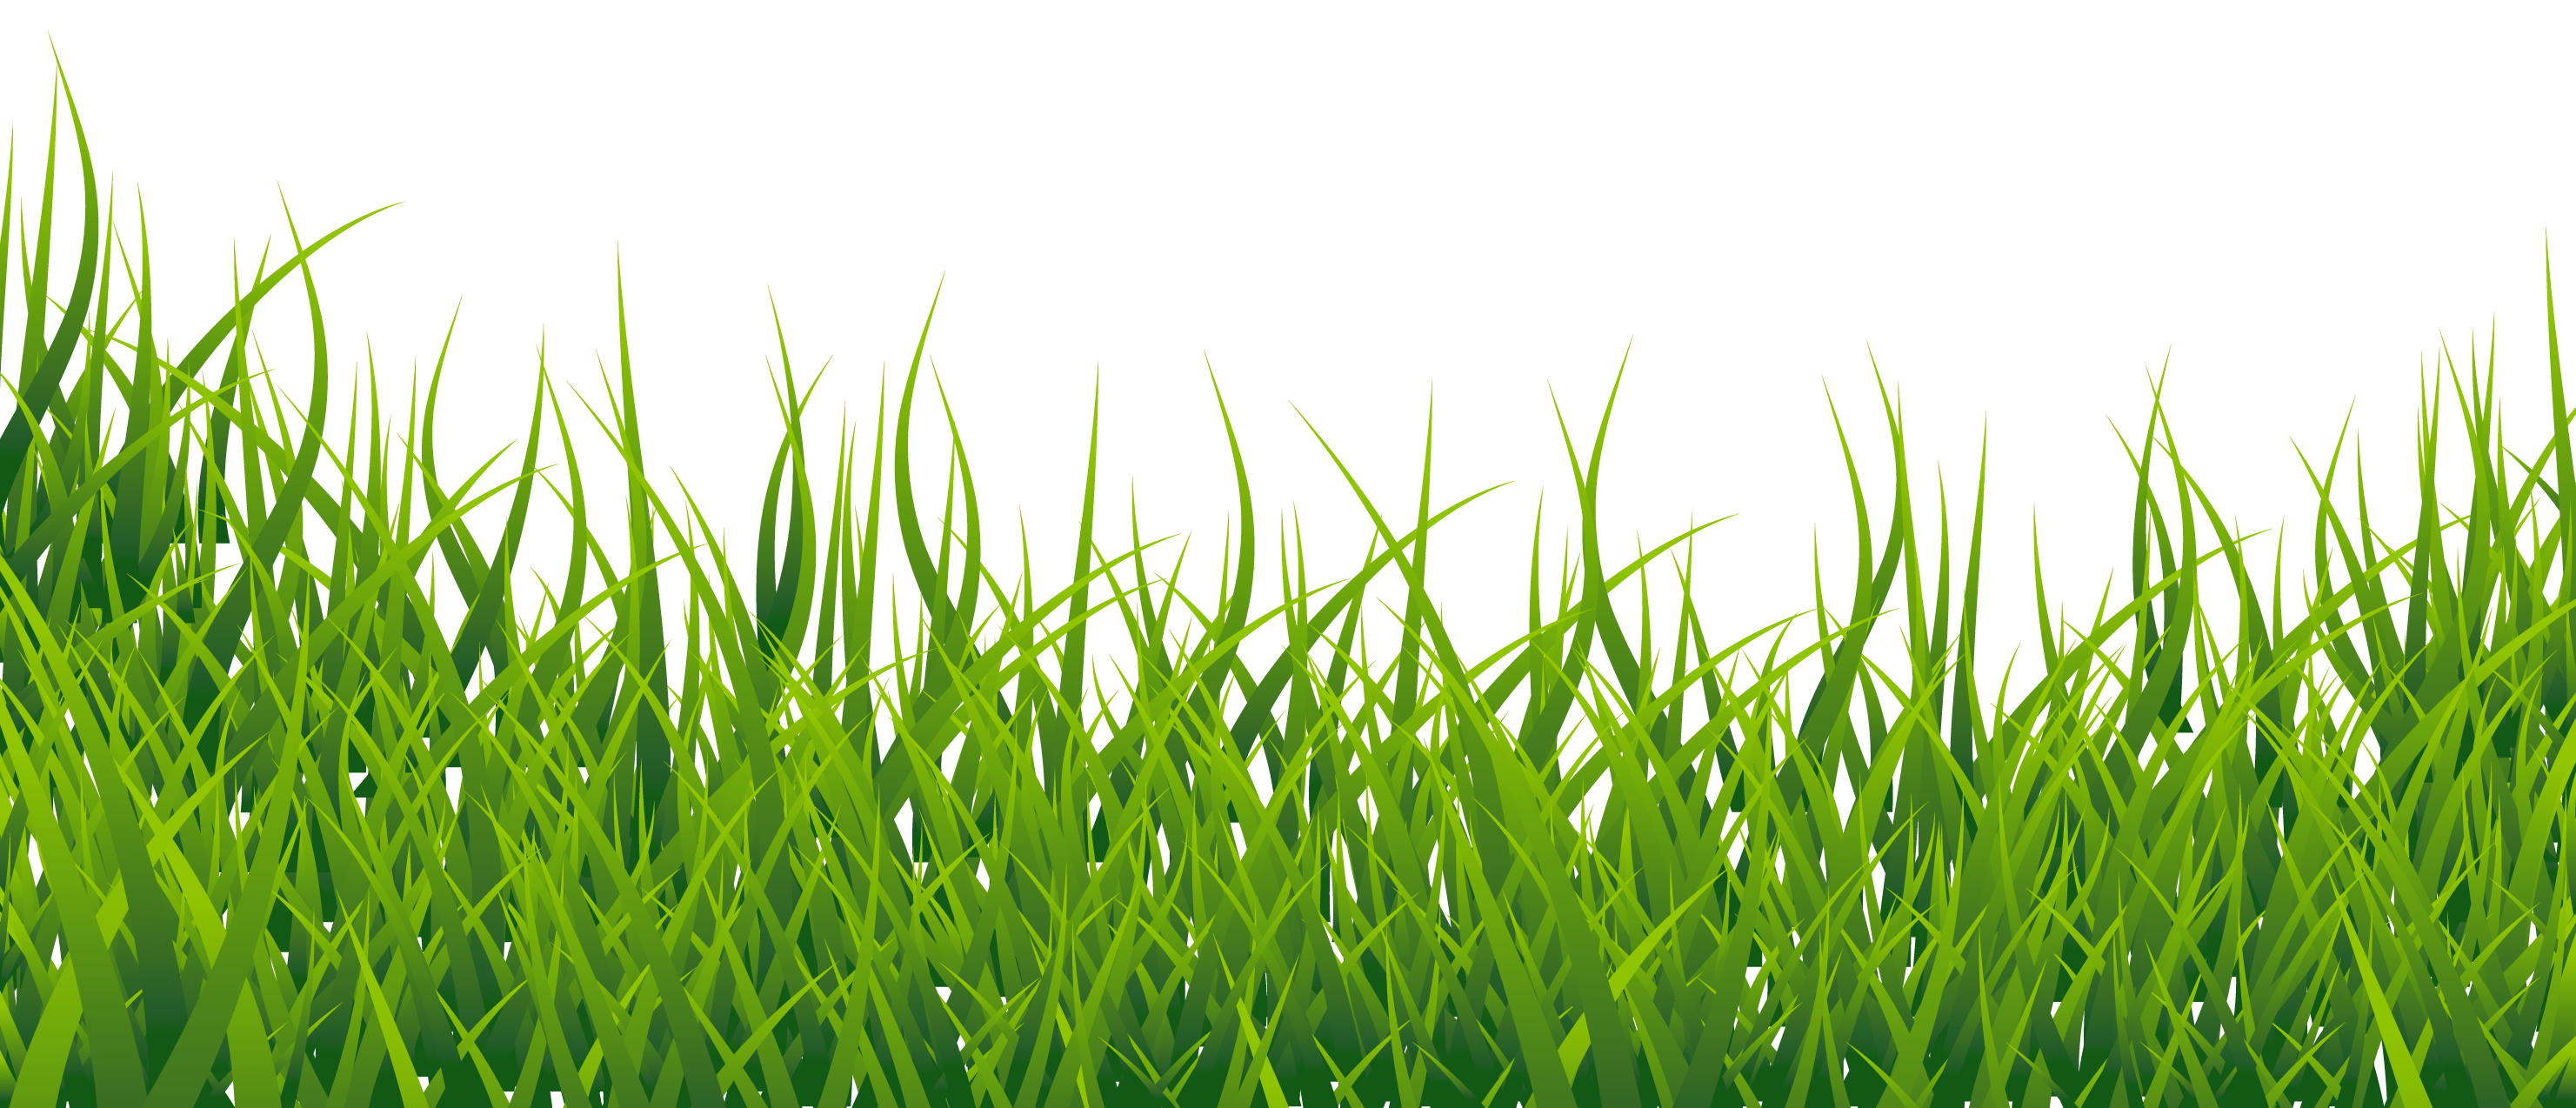 Hd Grass PNG Transparent Image